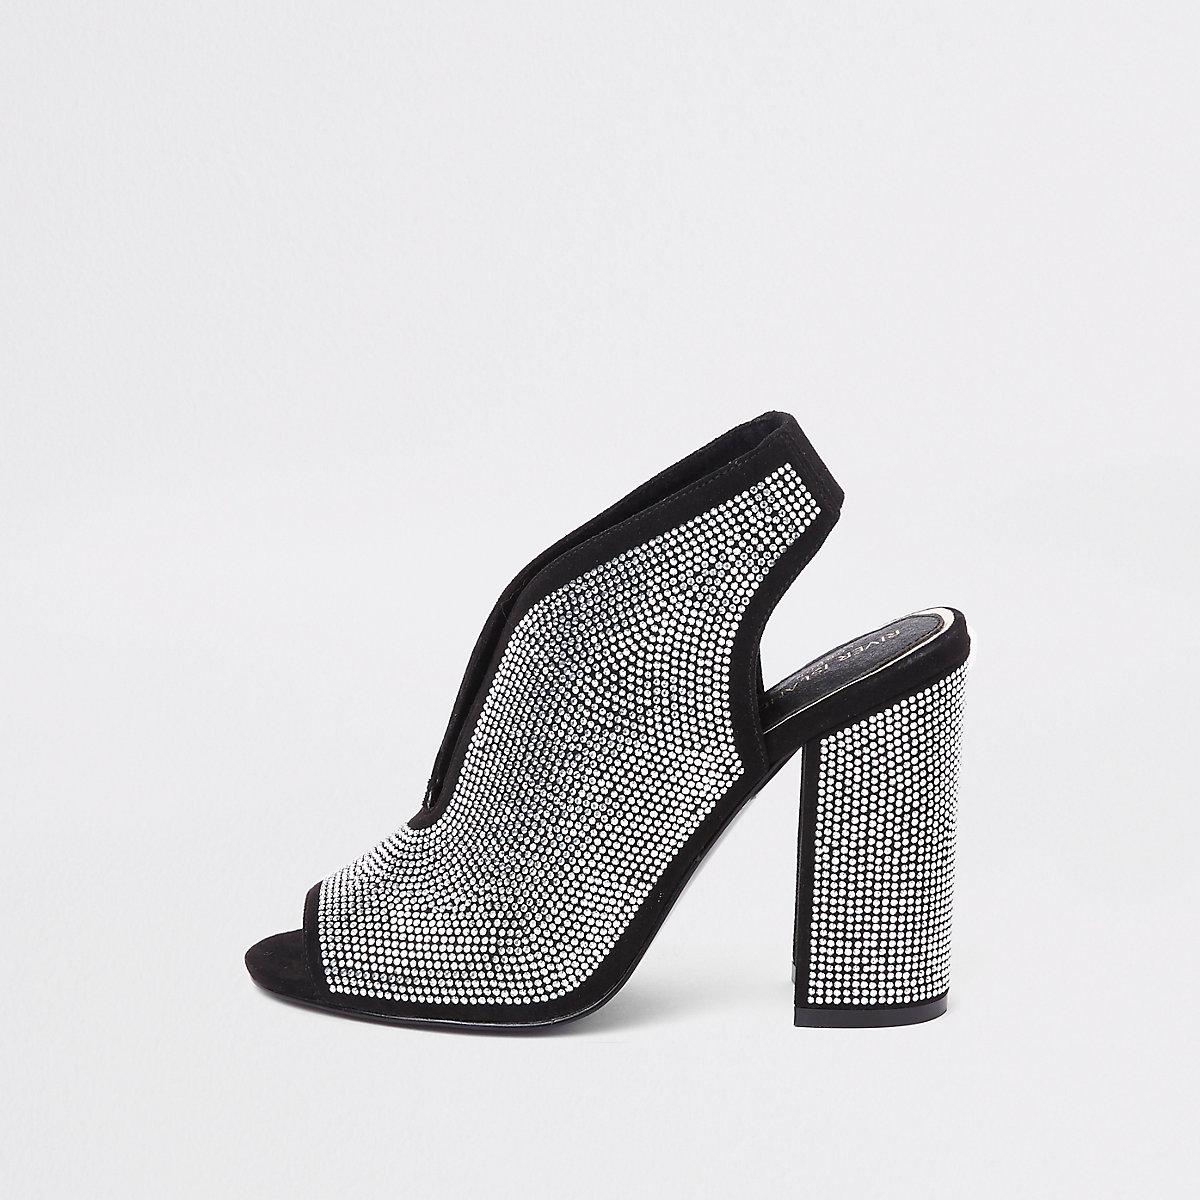 Silver heatseal curve vamp shoe boots